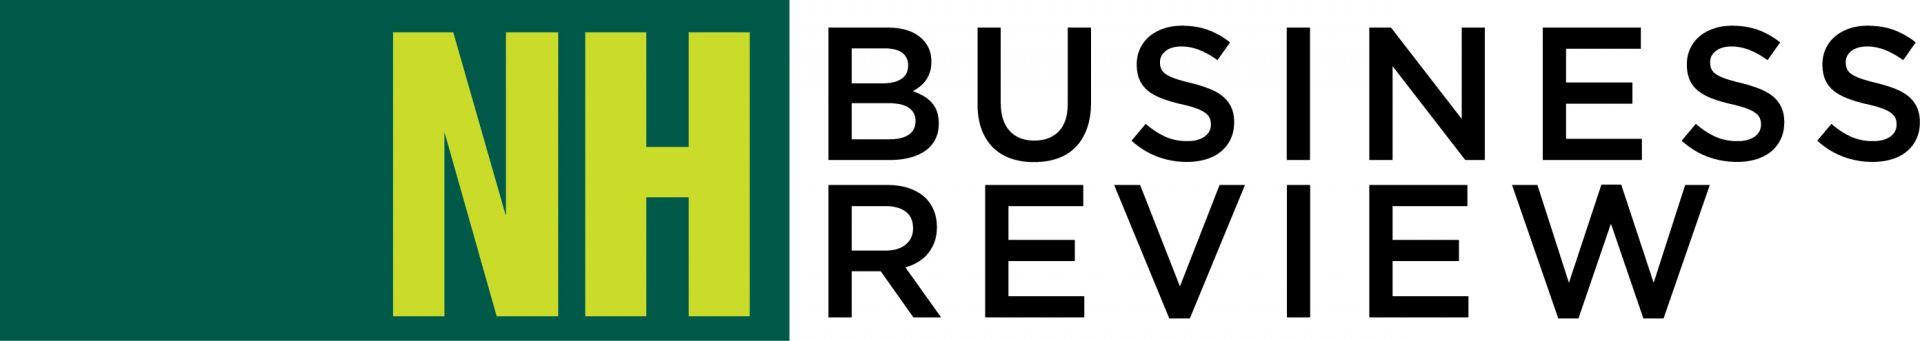 nhbr logo 2015-RGB